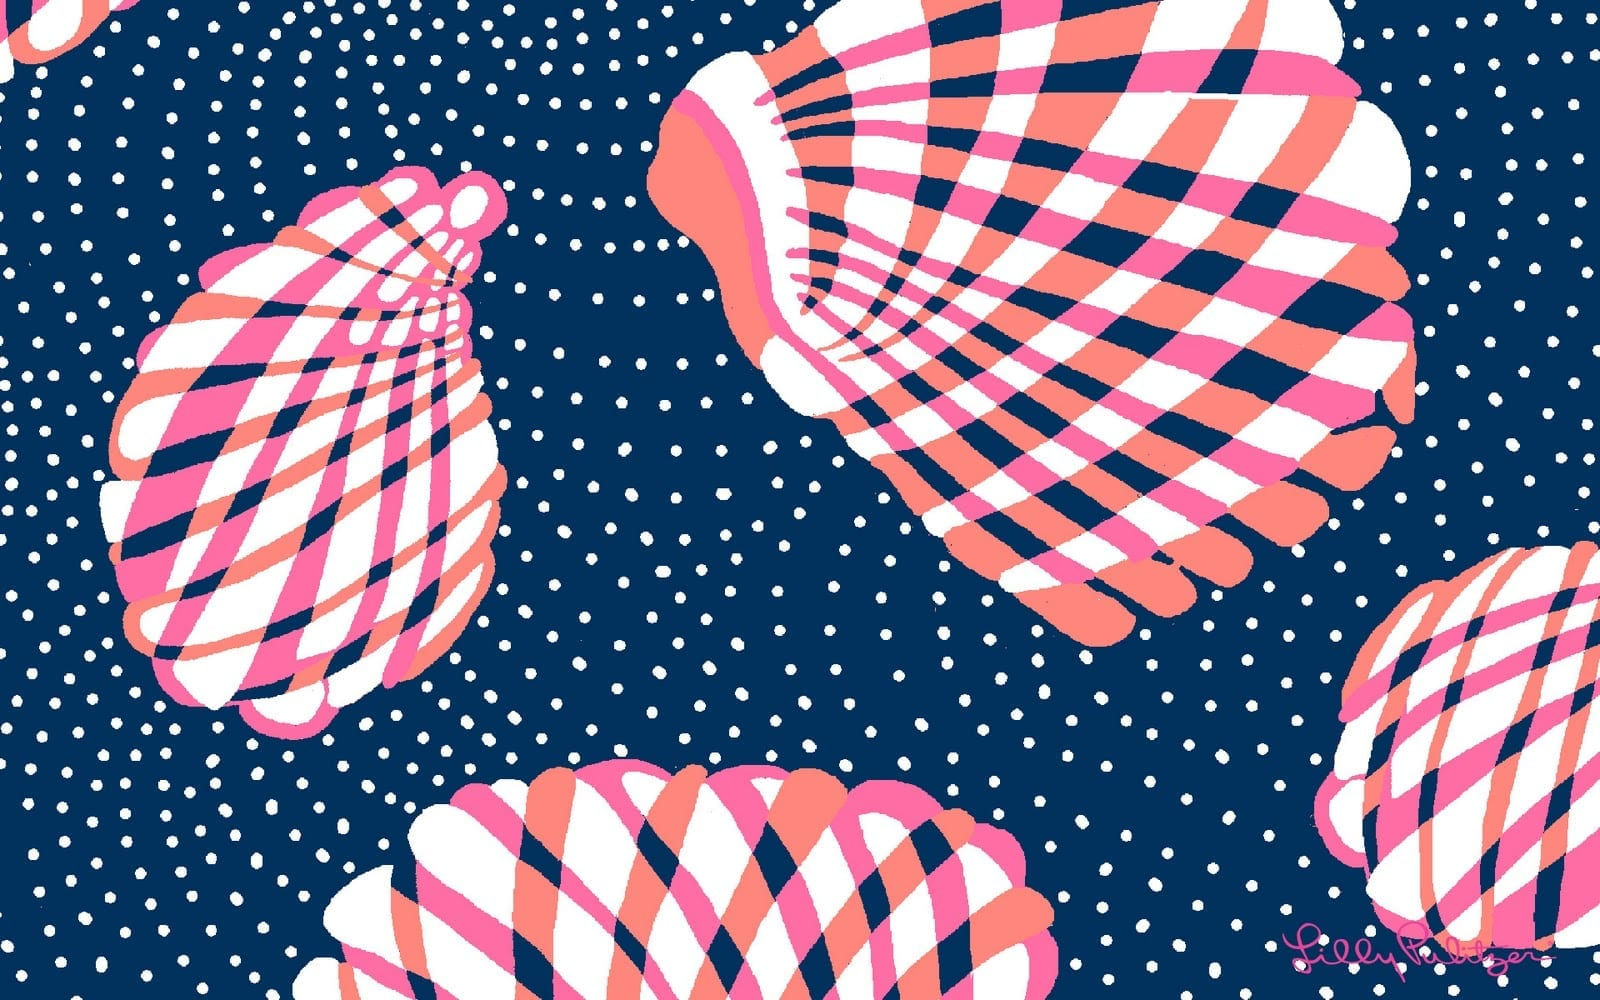 Lilly Pulitzer Fall Wallpaper 15 Stylish Desktop Wallpapers Modern Day Moms